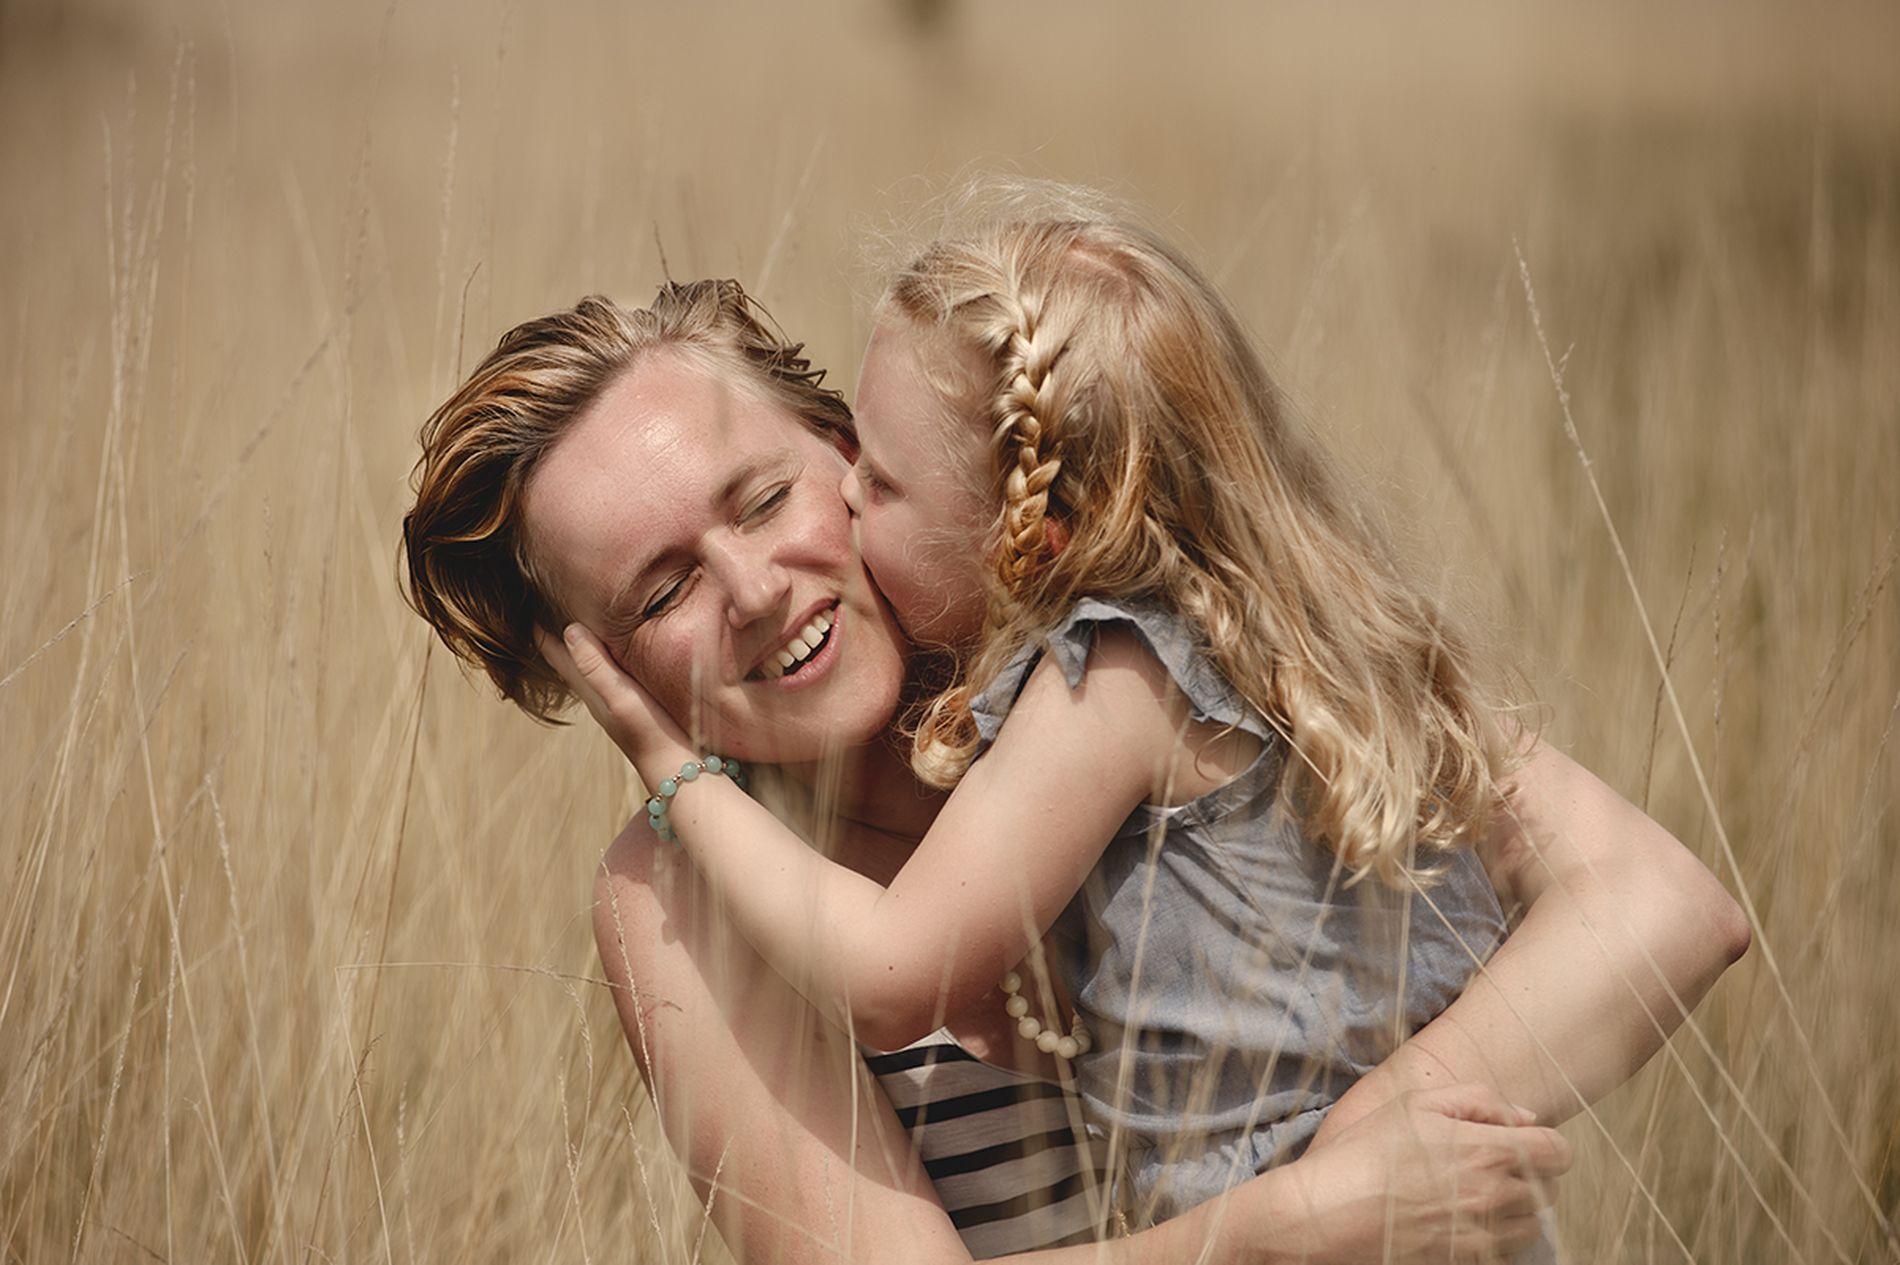 Bart-Boodts-1 MCP Actions Sponsored GuruShots Motherhood Photo Challenge Winners Contests